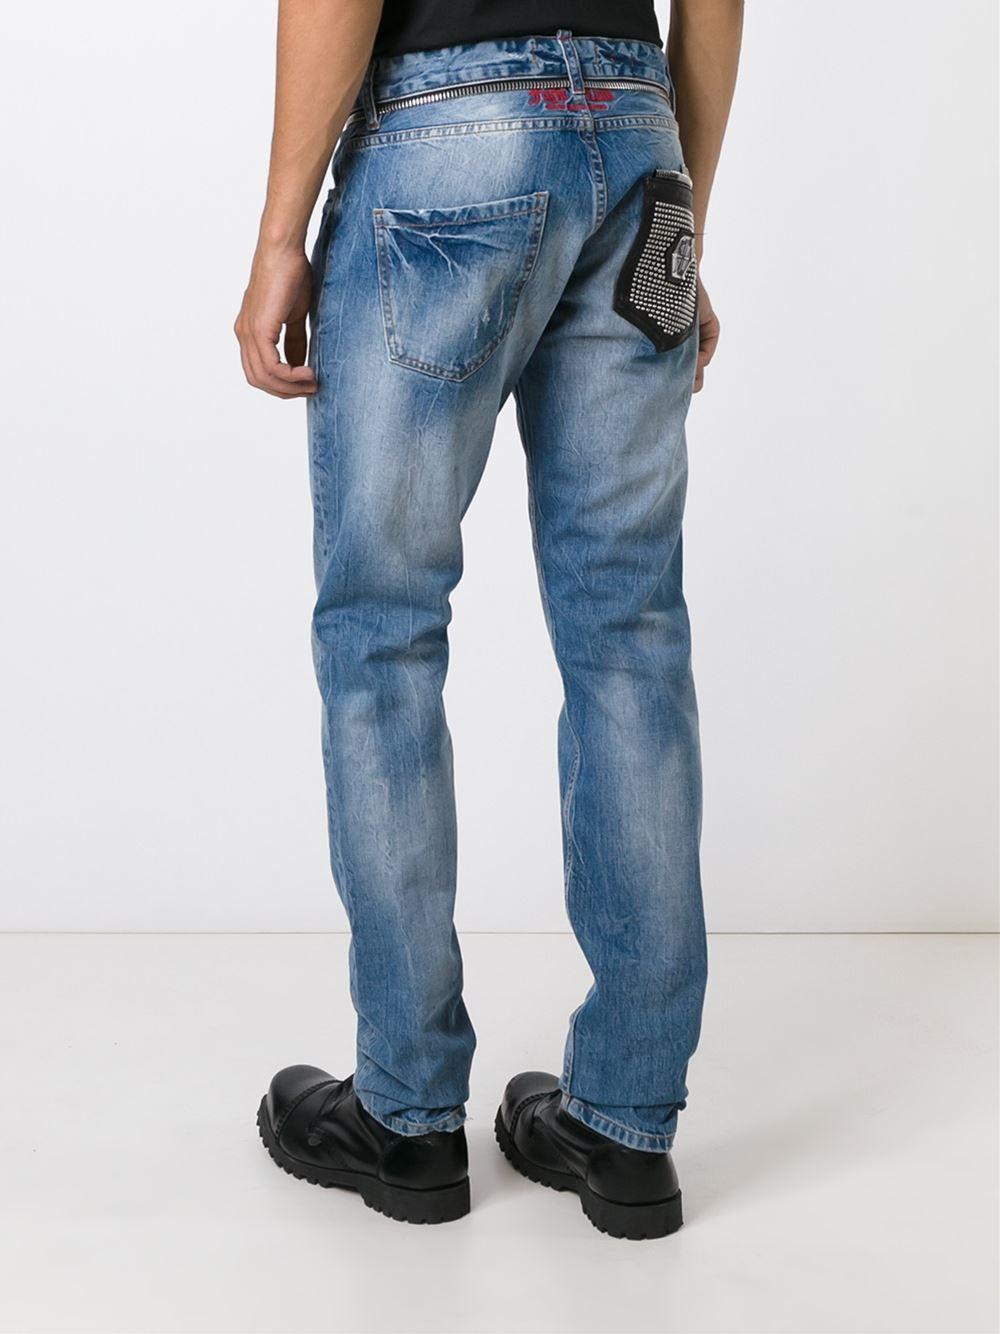 philipp plein distressed straight leg jeans in blue for men lyst. Black Bedroom Furniture Sets. Home Design Ideas